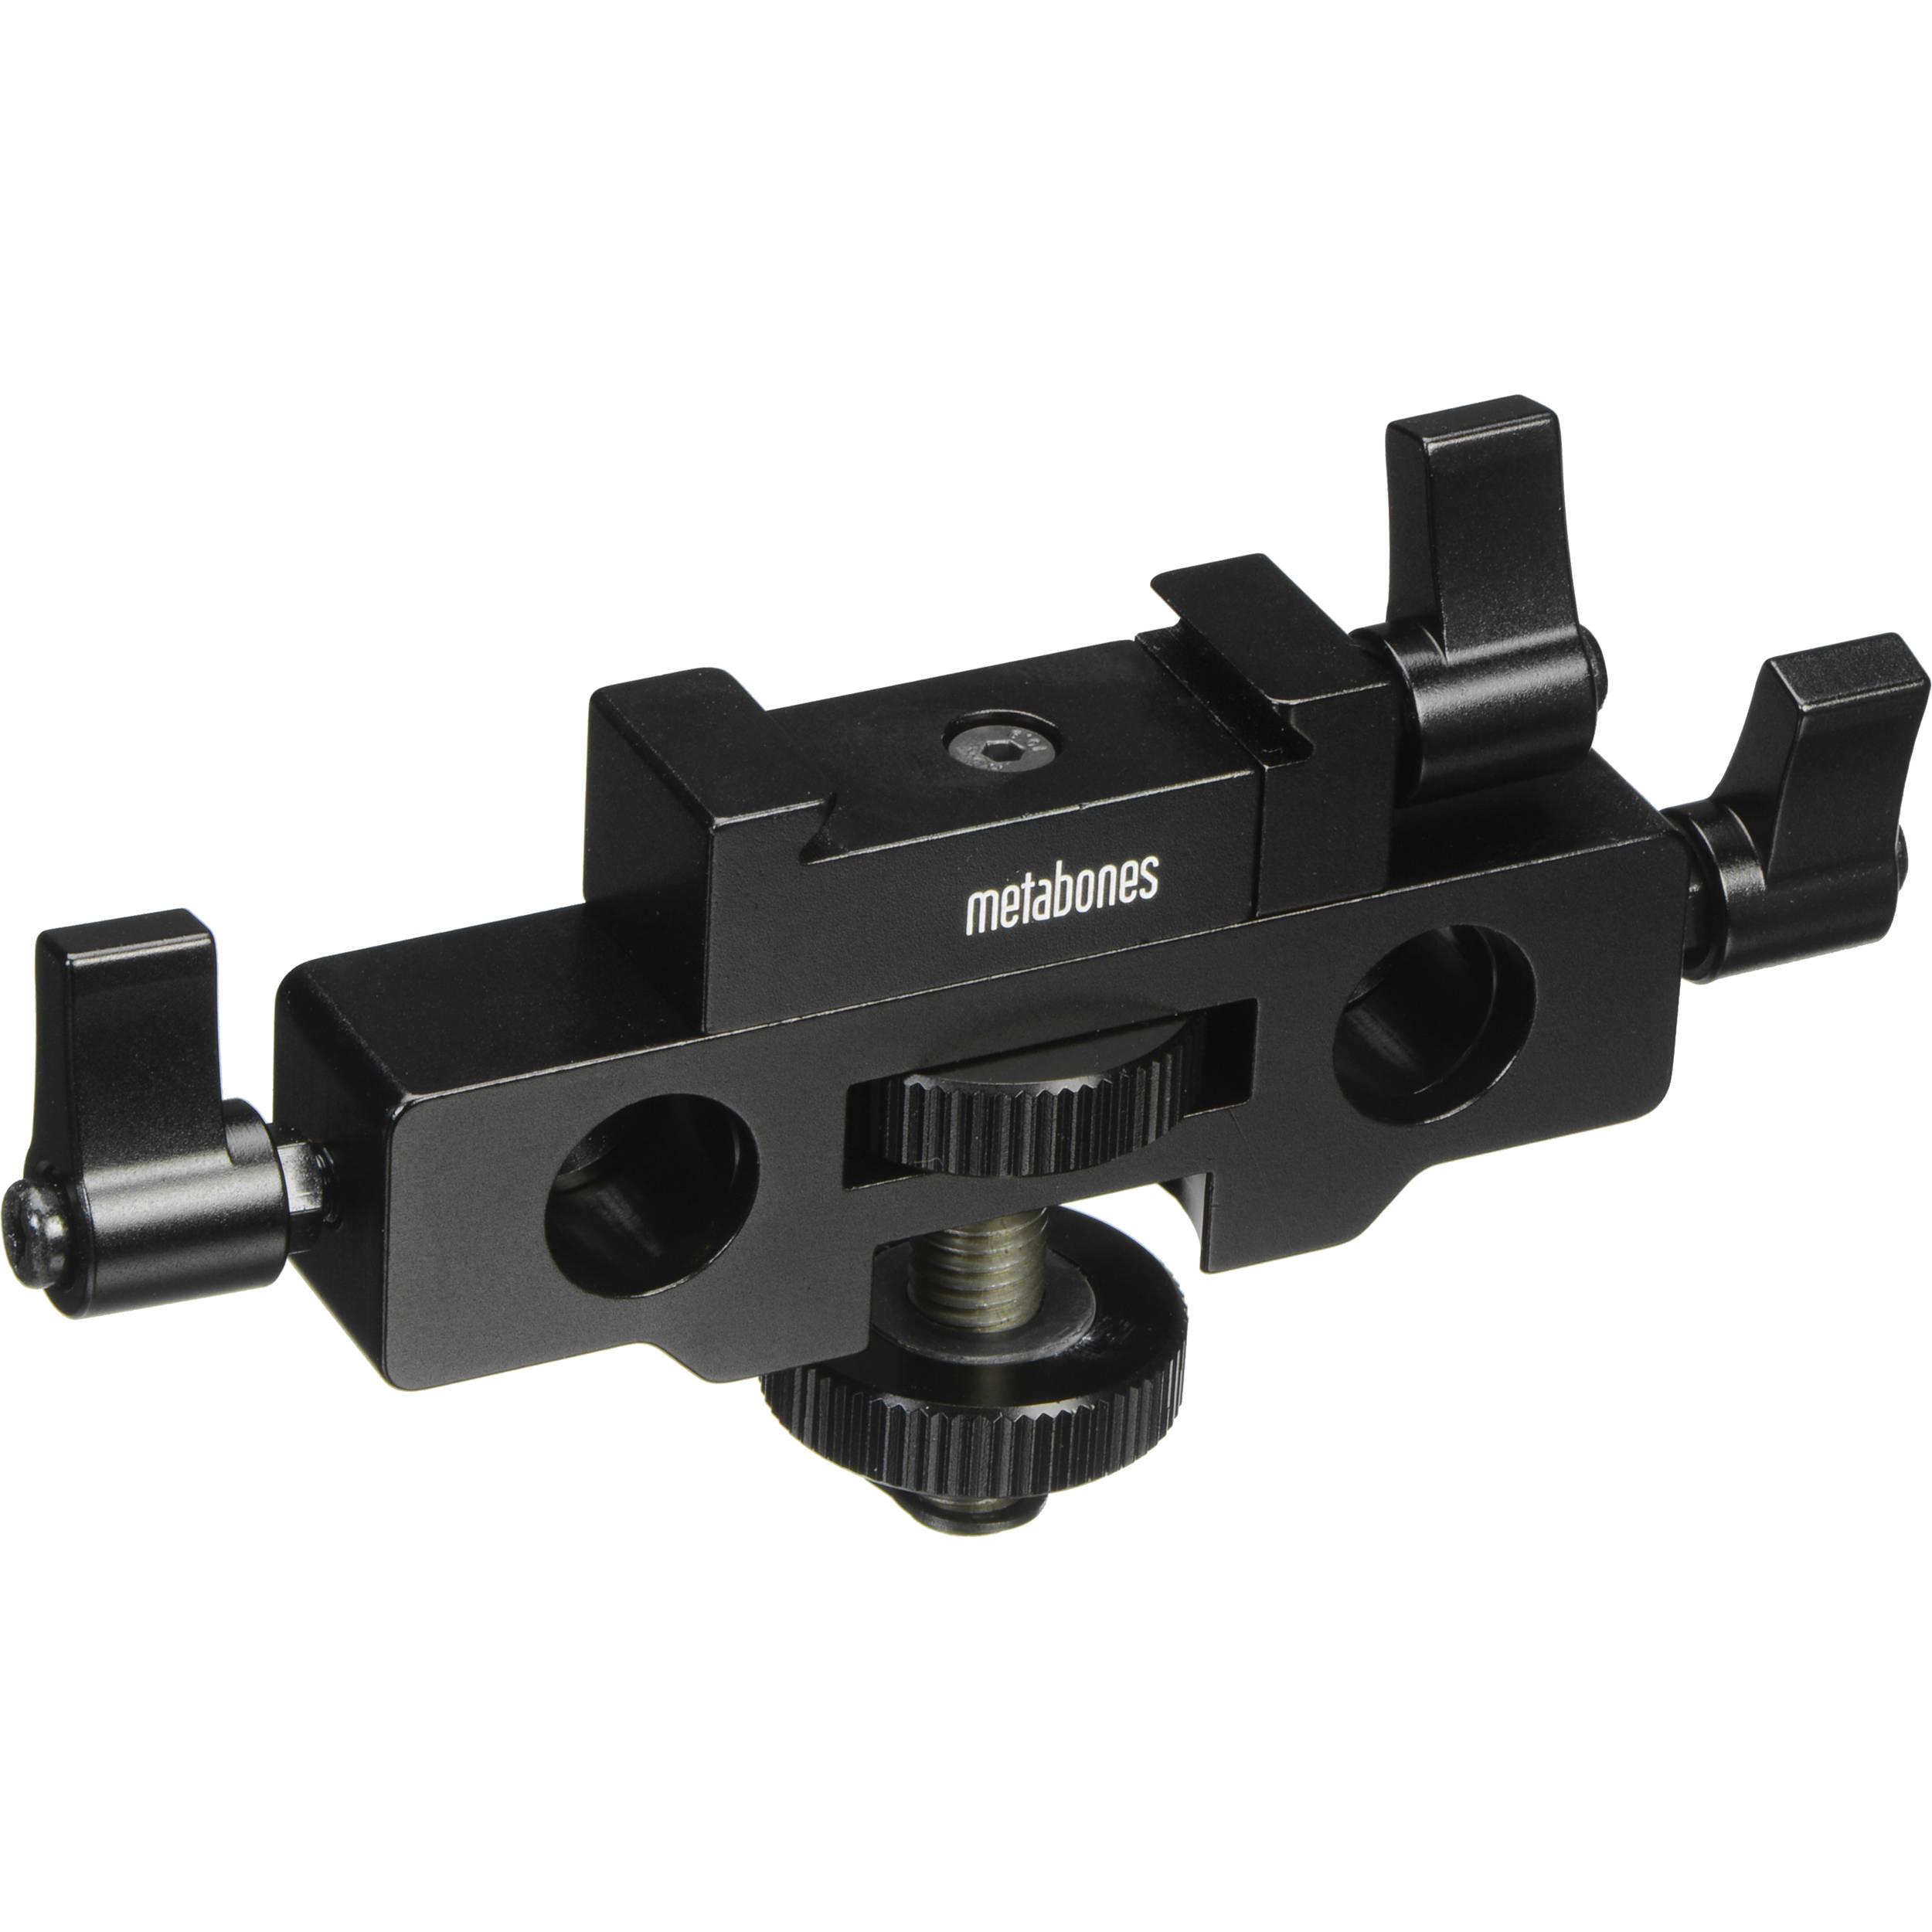 Metabones 15mm Rod Lens Adapter Support Mb Mr Sk Bm1 Bh Photo Peugeot 207 Fuse Box Problems